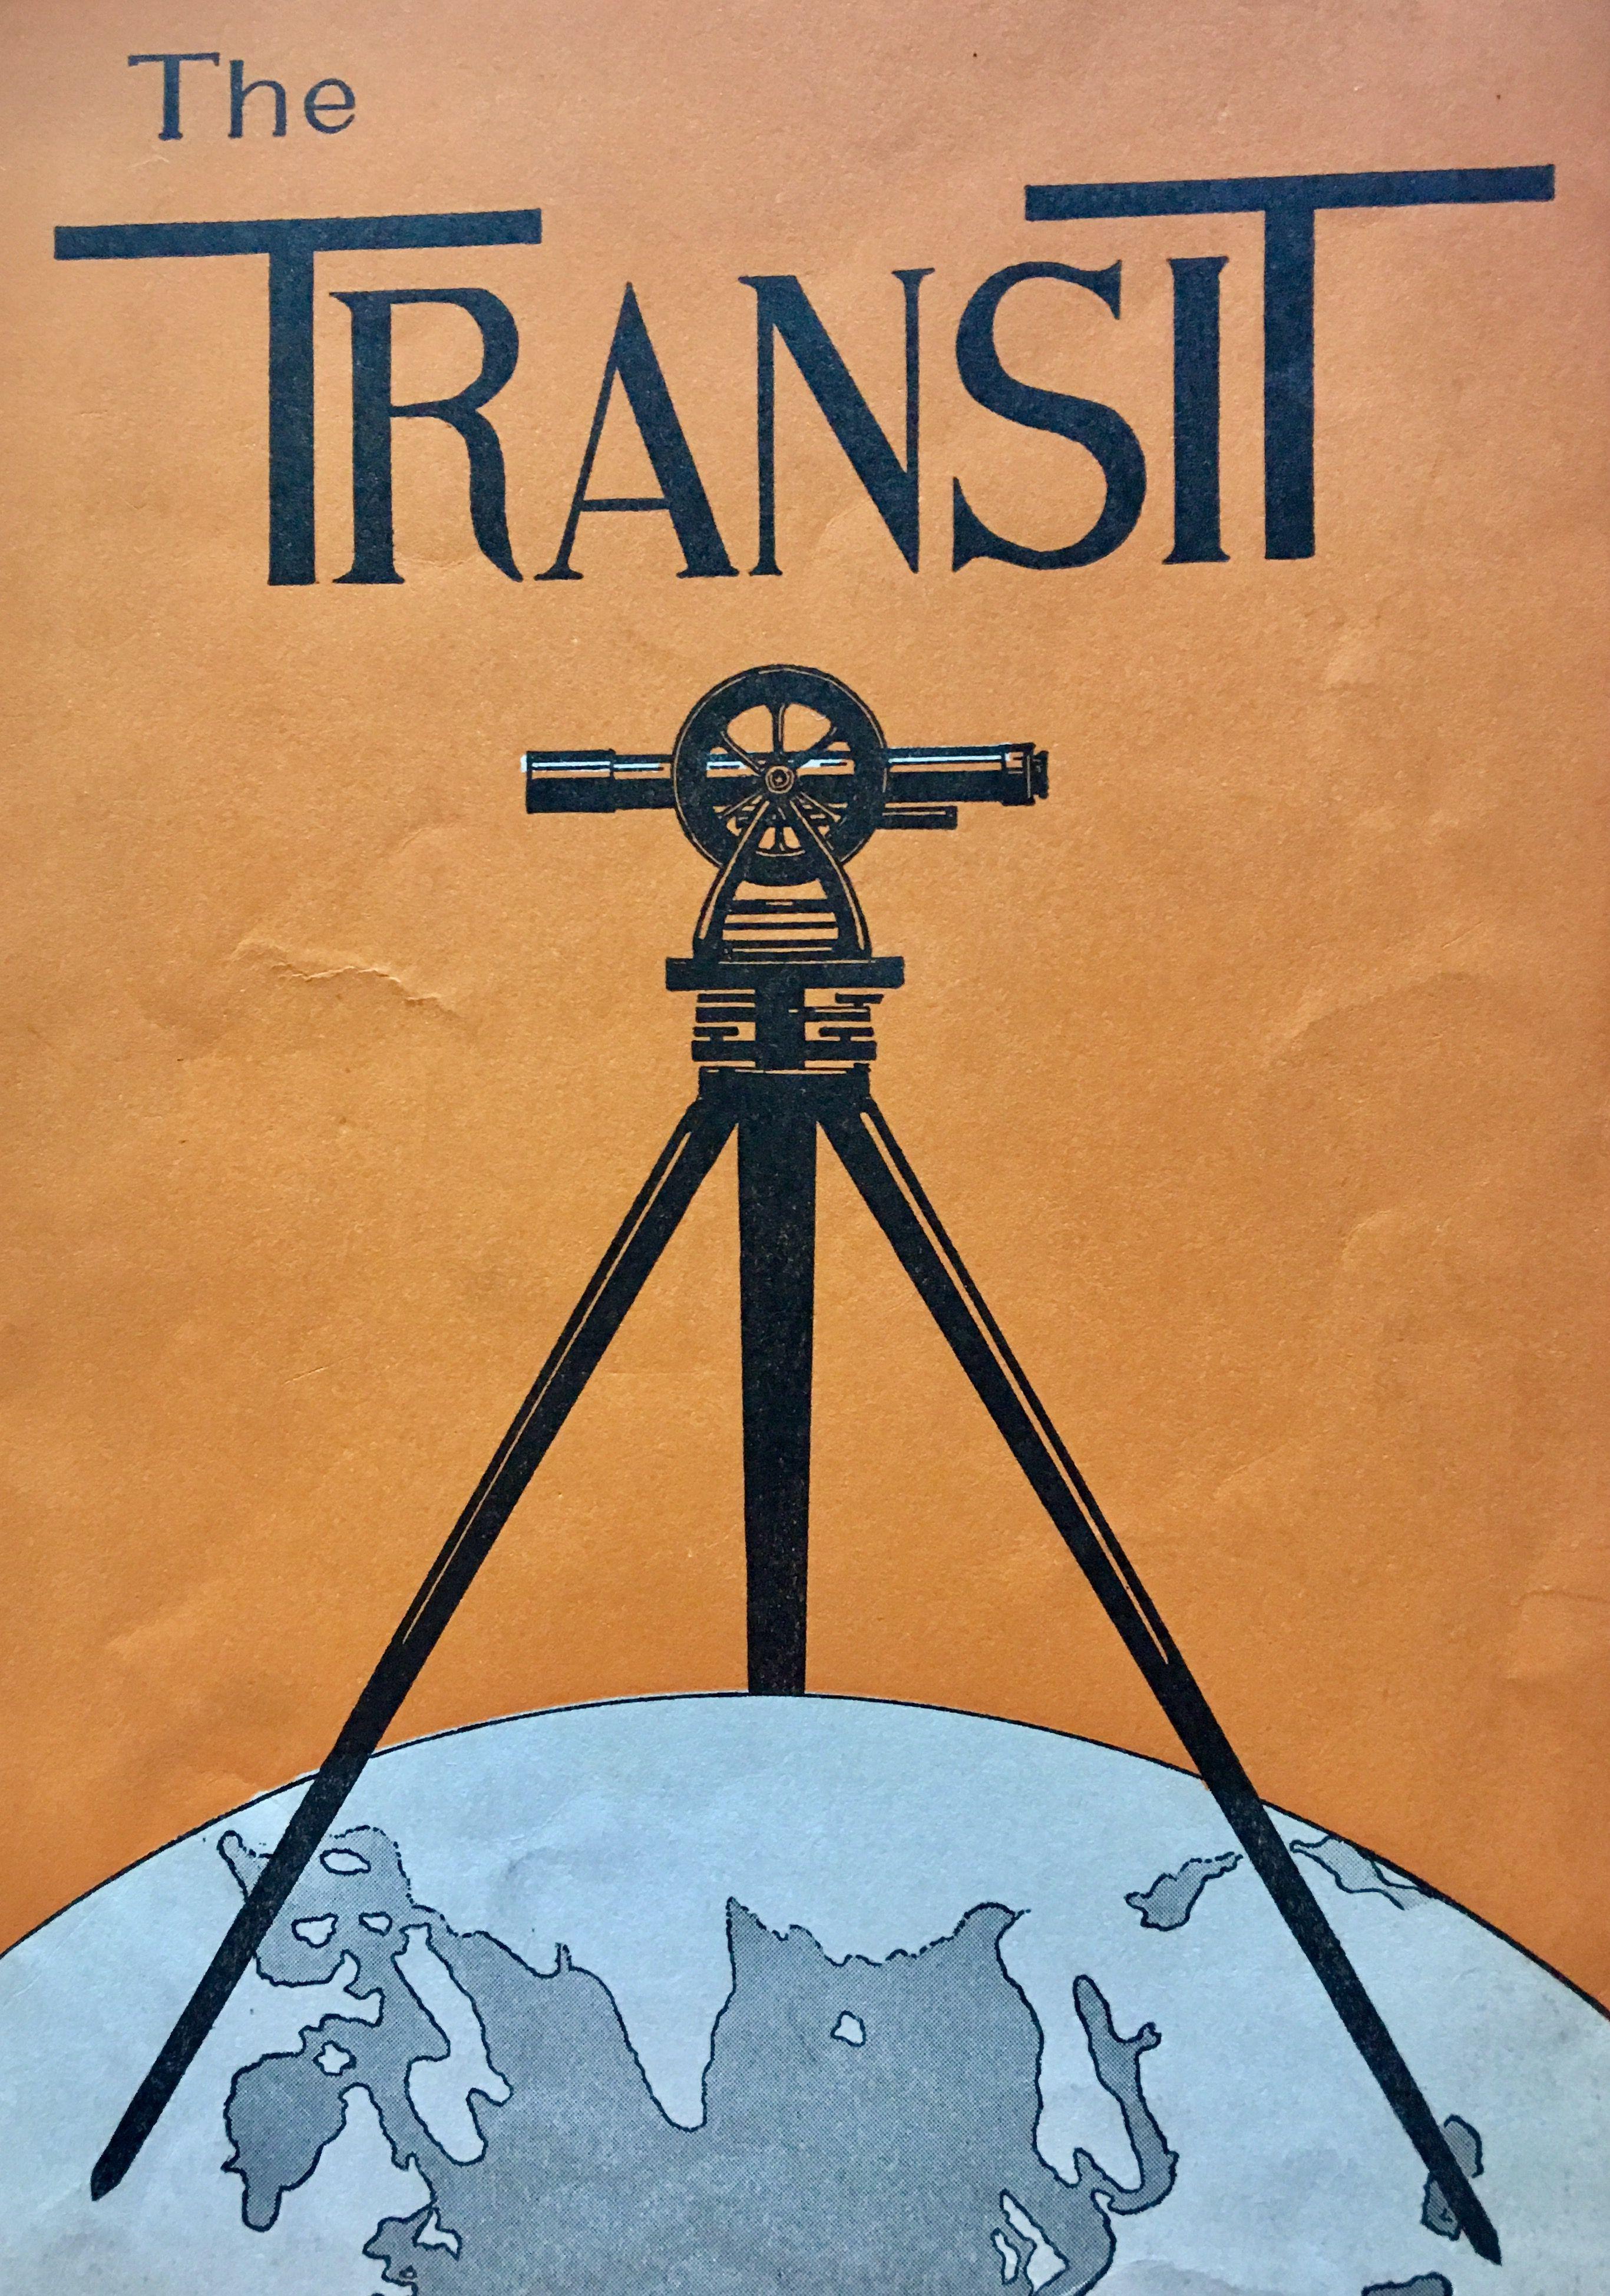 1929 The Transit Land surveyors, Cool posters